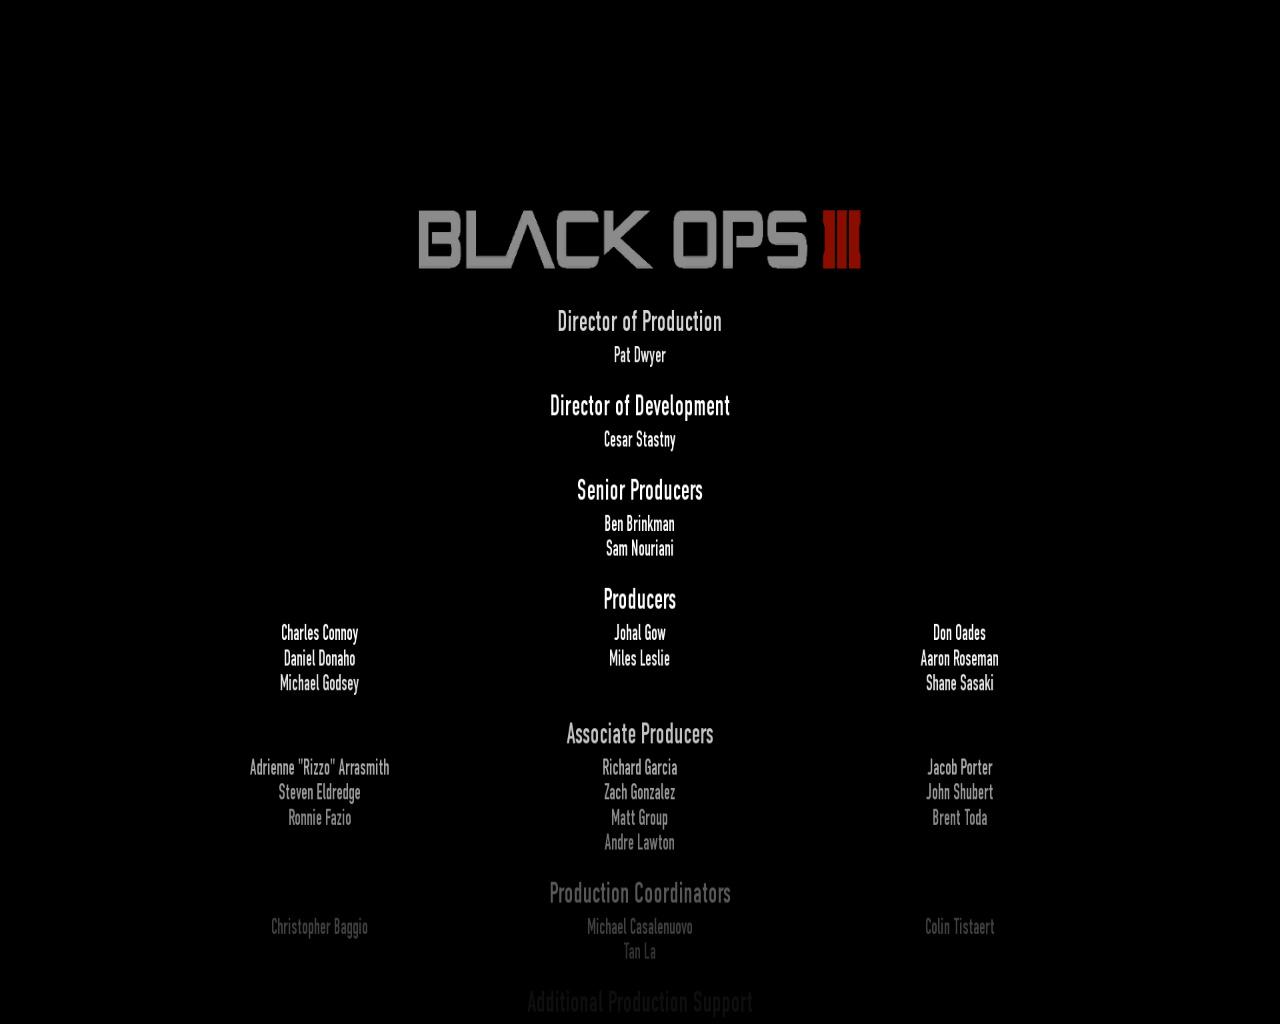 BlackOps3 2016-03-23 22-02-06-874.jpg - Call of Duty: Black Ops 3